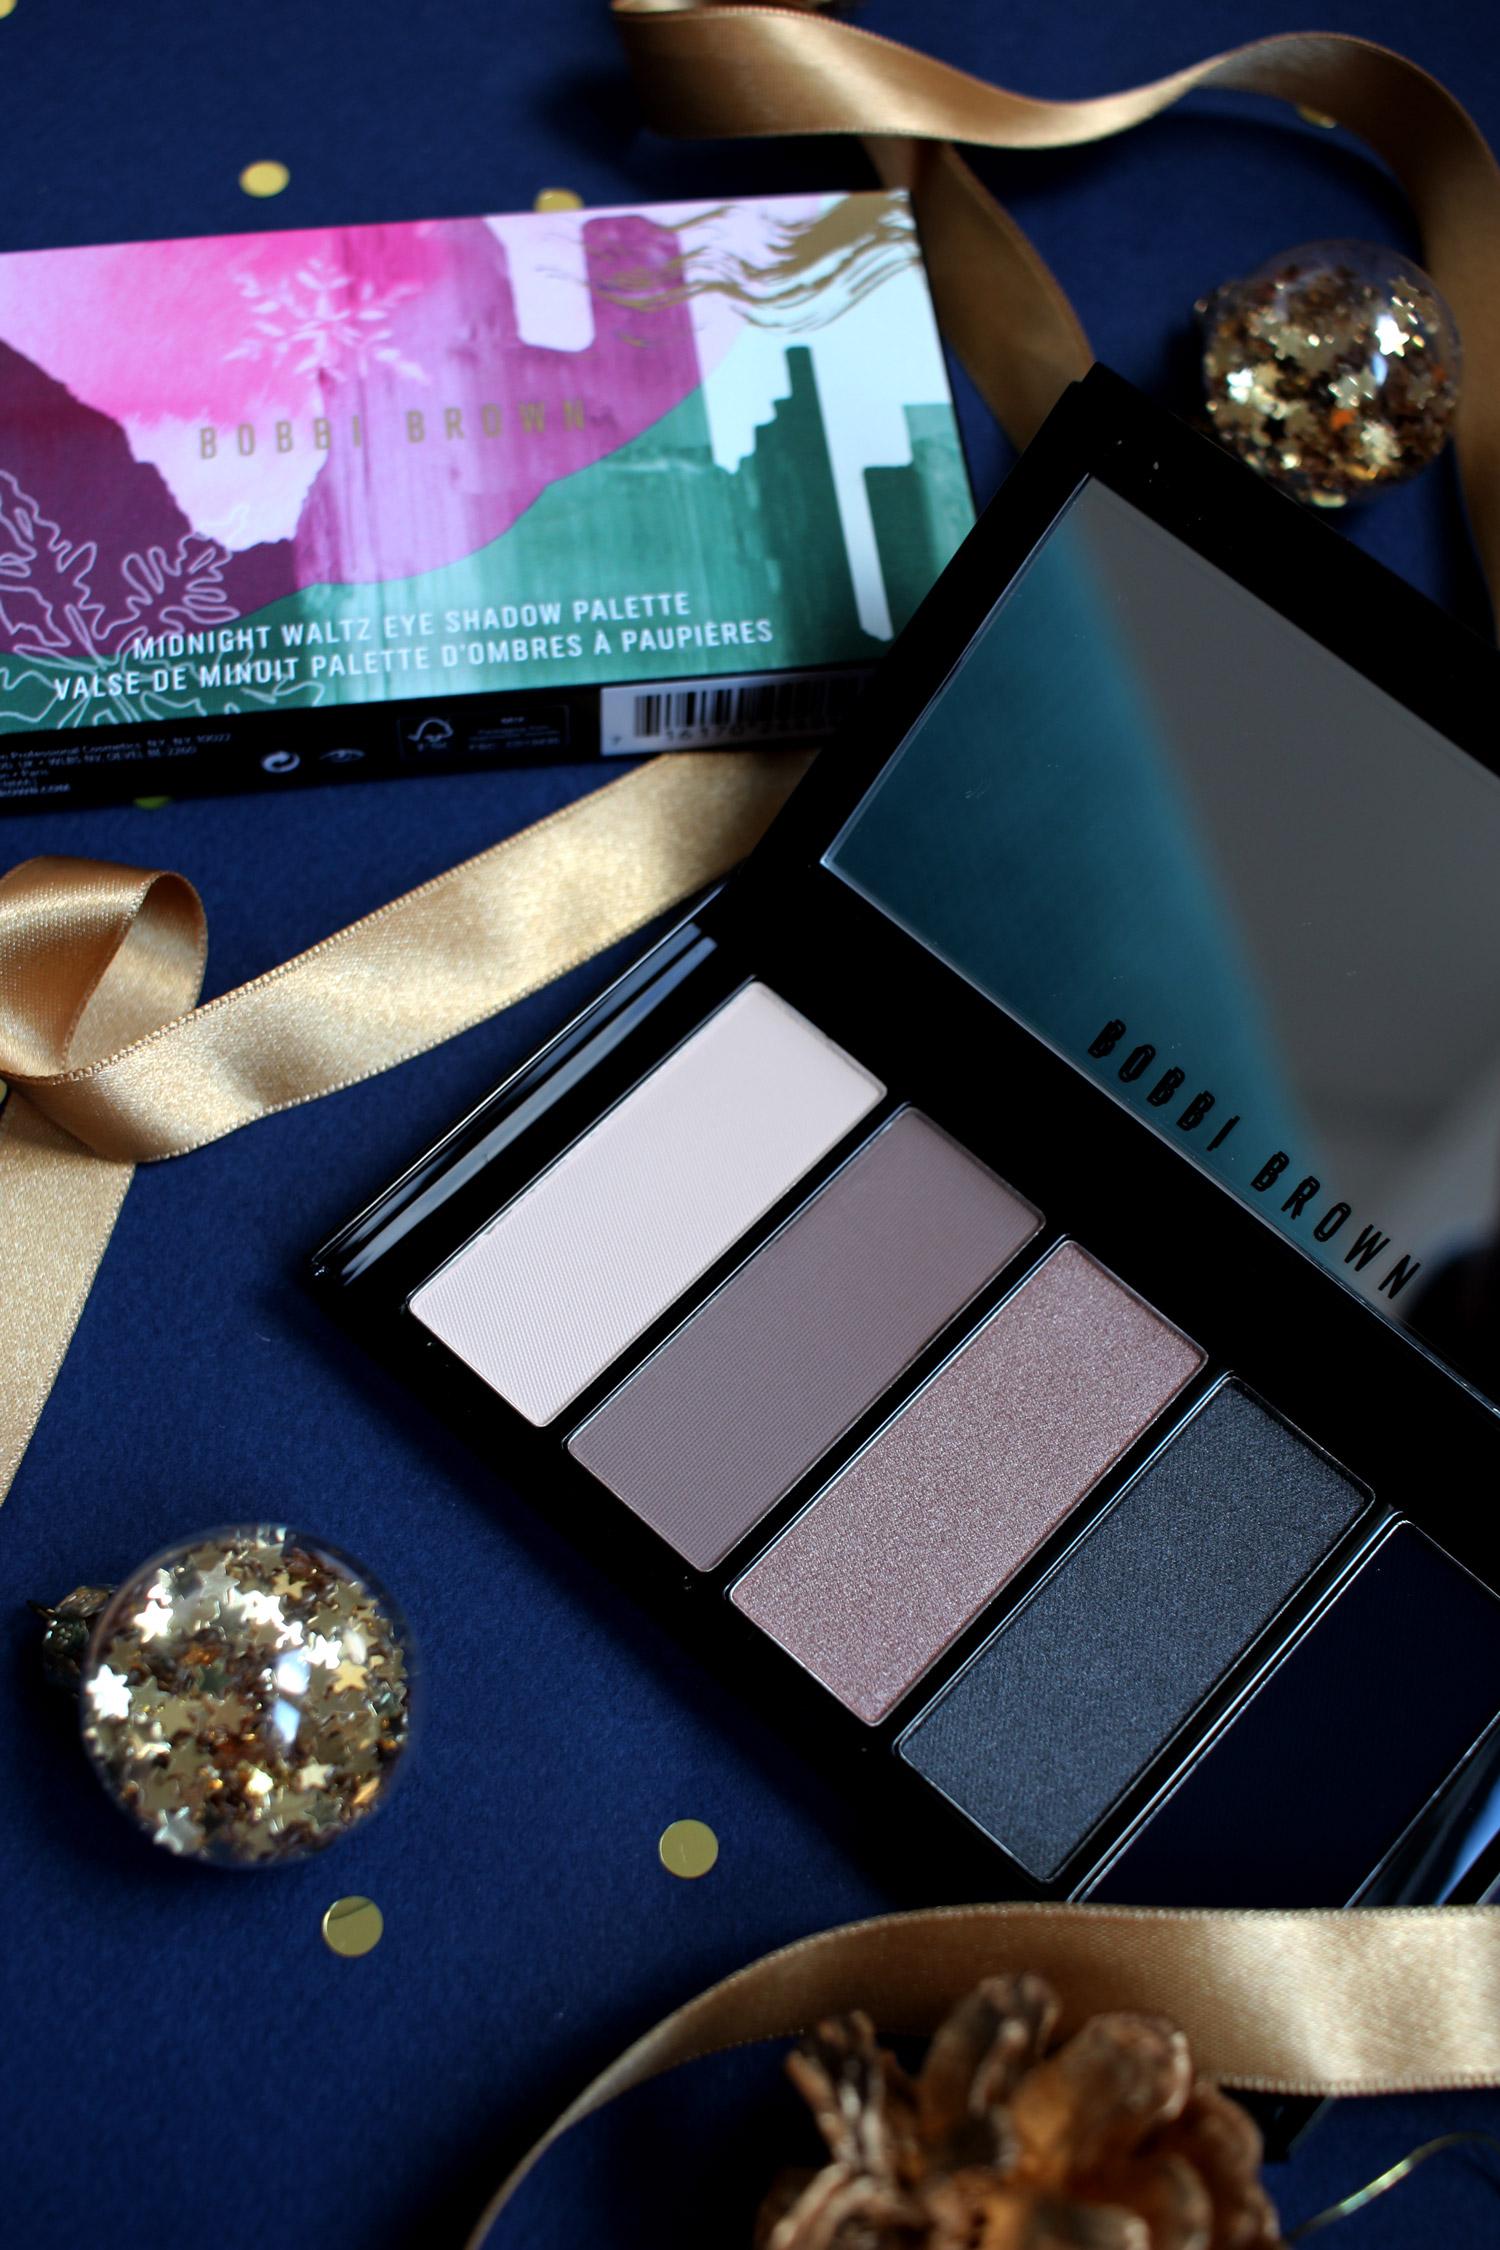 christmas-2020-beauty-gift-guide-bobbi-brown-midnight-waltz-eyeshadow-palette